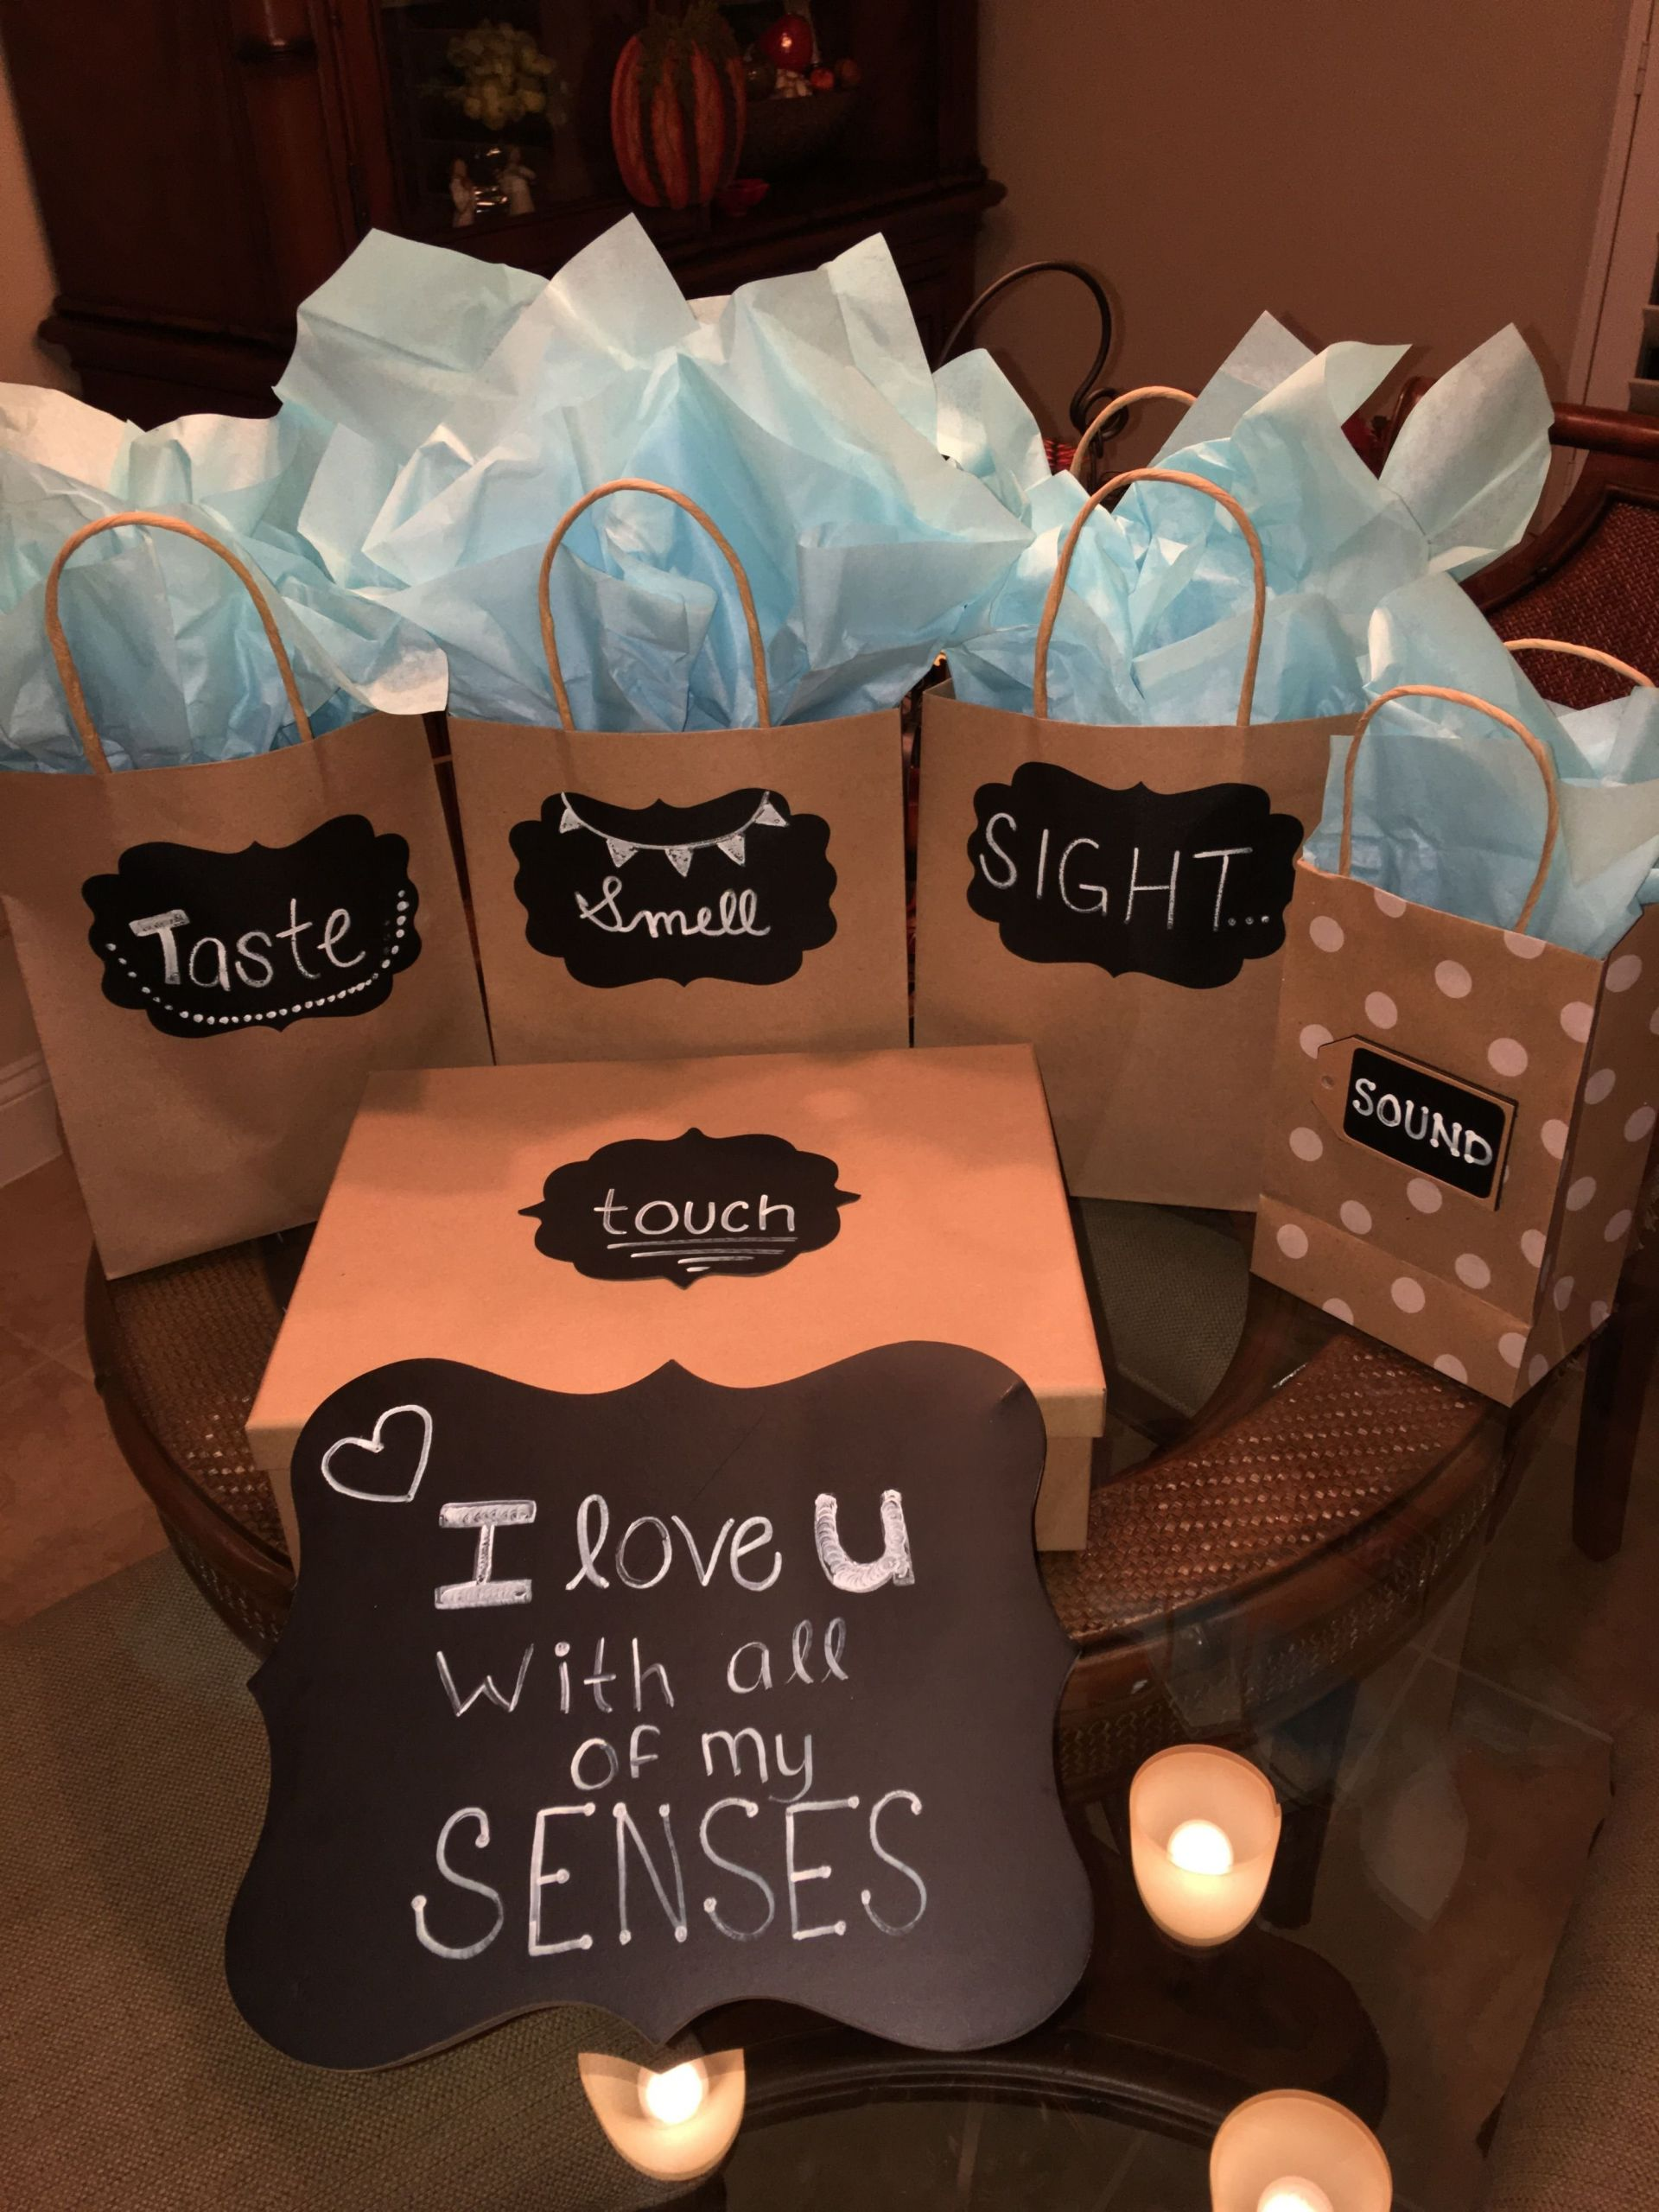 Homemade Gift Ideas Your Boyfriend  10 Lovable Romantic Birthday Gift Ideas Boyfriend 2020